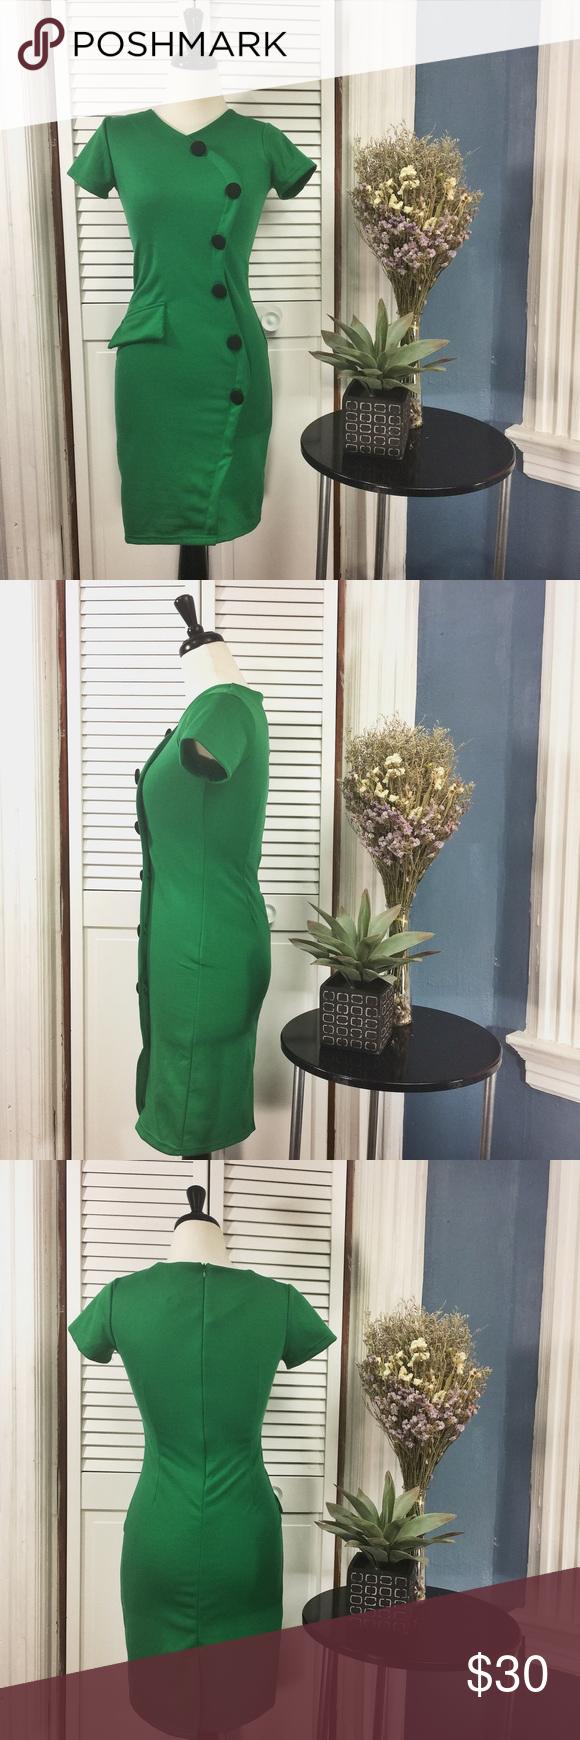 Green dress short in front long in back  Vintage Handmade Short Sleeve Green Dress